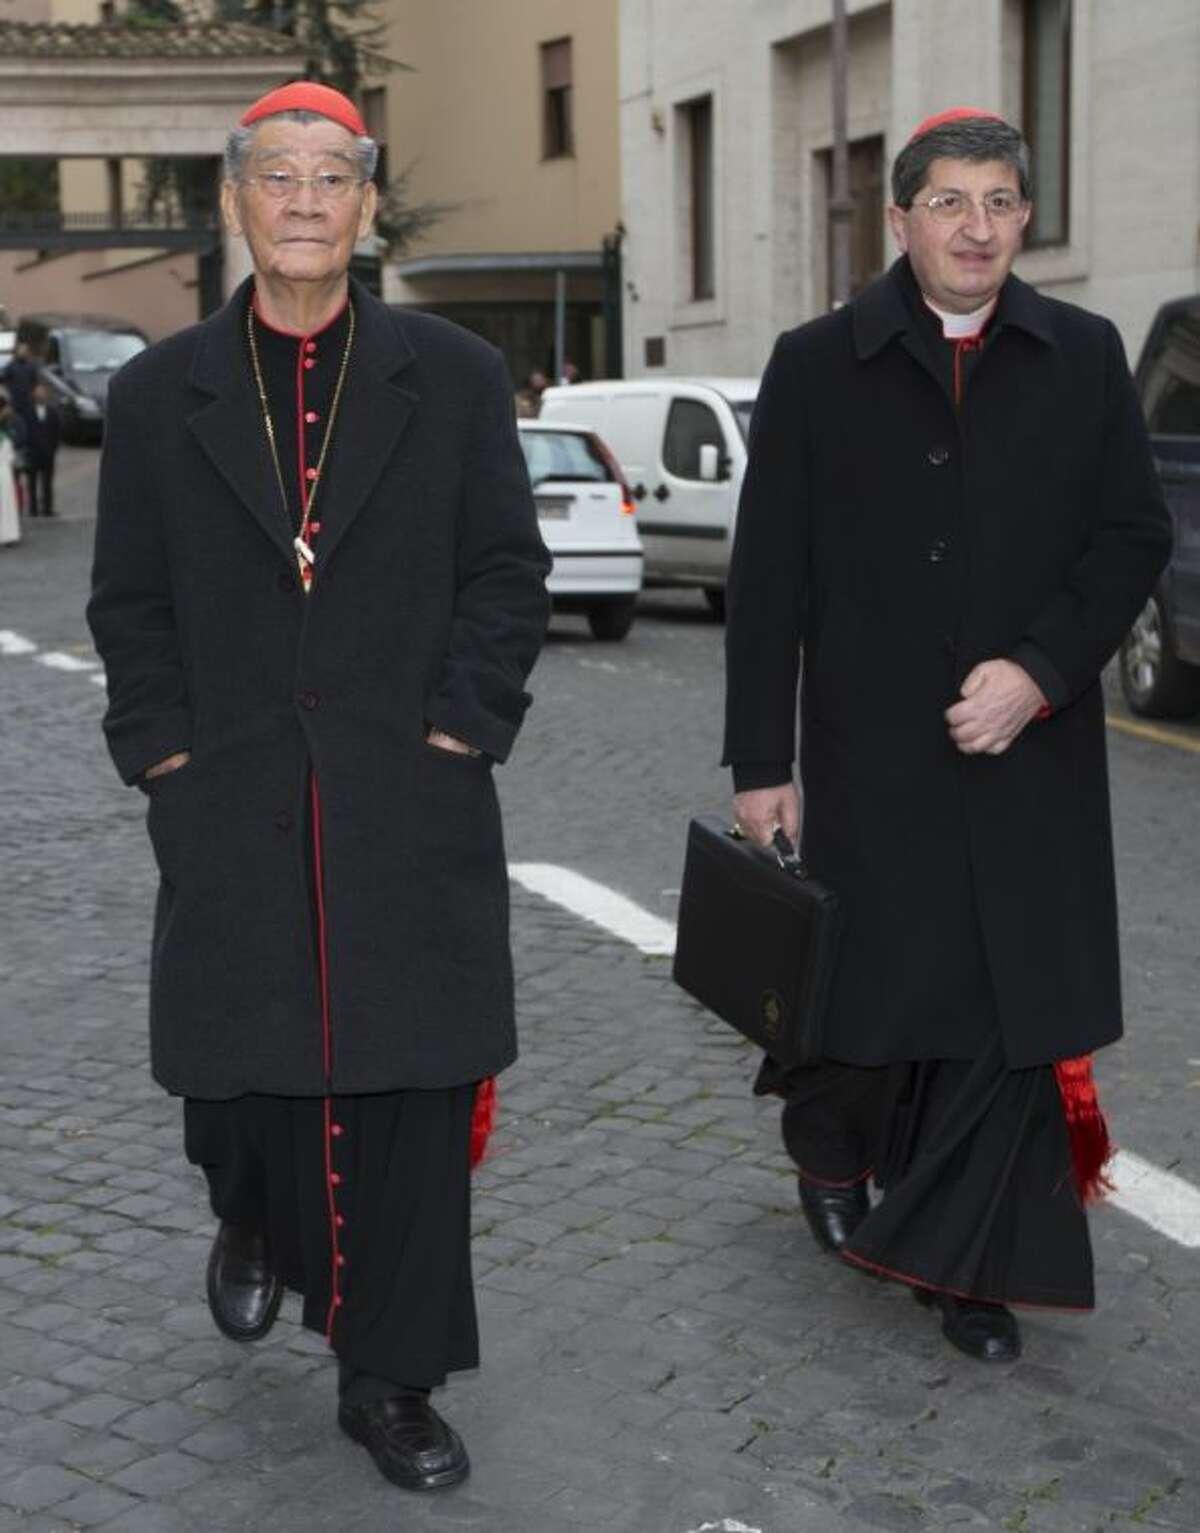 Vietnamese Cardinal Jean-Baptiste Pham Minh Man, left, and cardinal Giuseppe Betori arrive for a meeting at the Vatican Thursday.